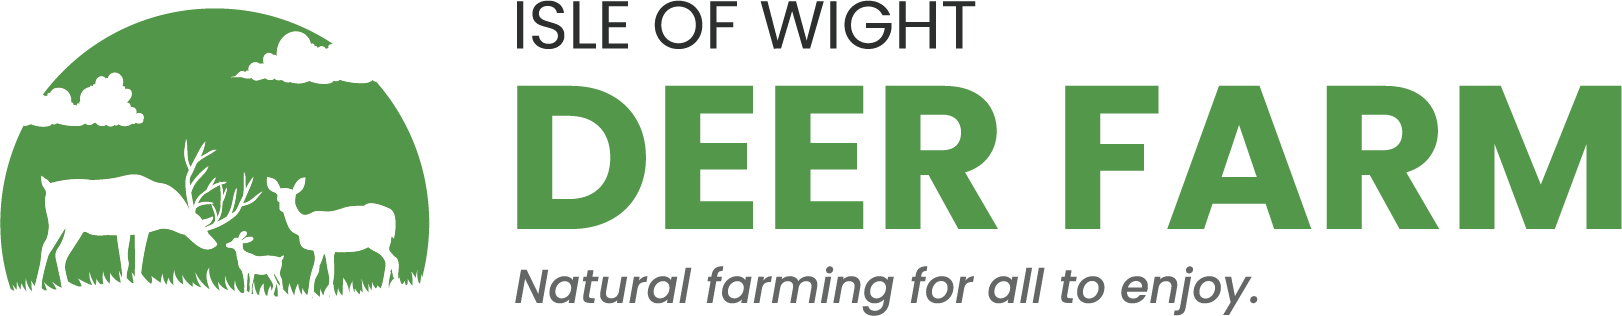 Isle of Wight Deer Farm